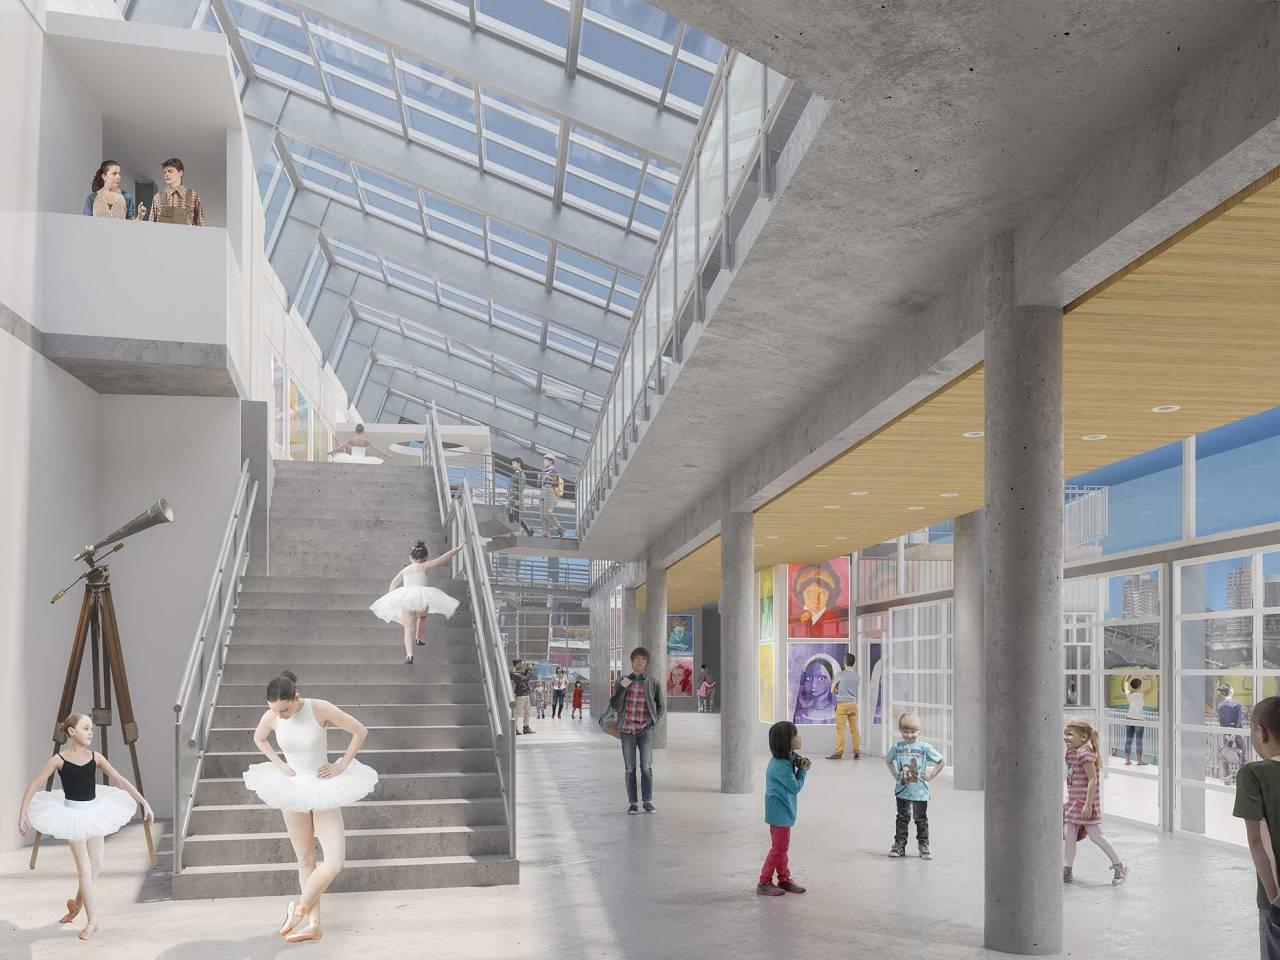 Arts-Umbrella-The-New-Limitless-New-Building-1